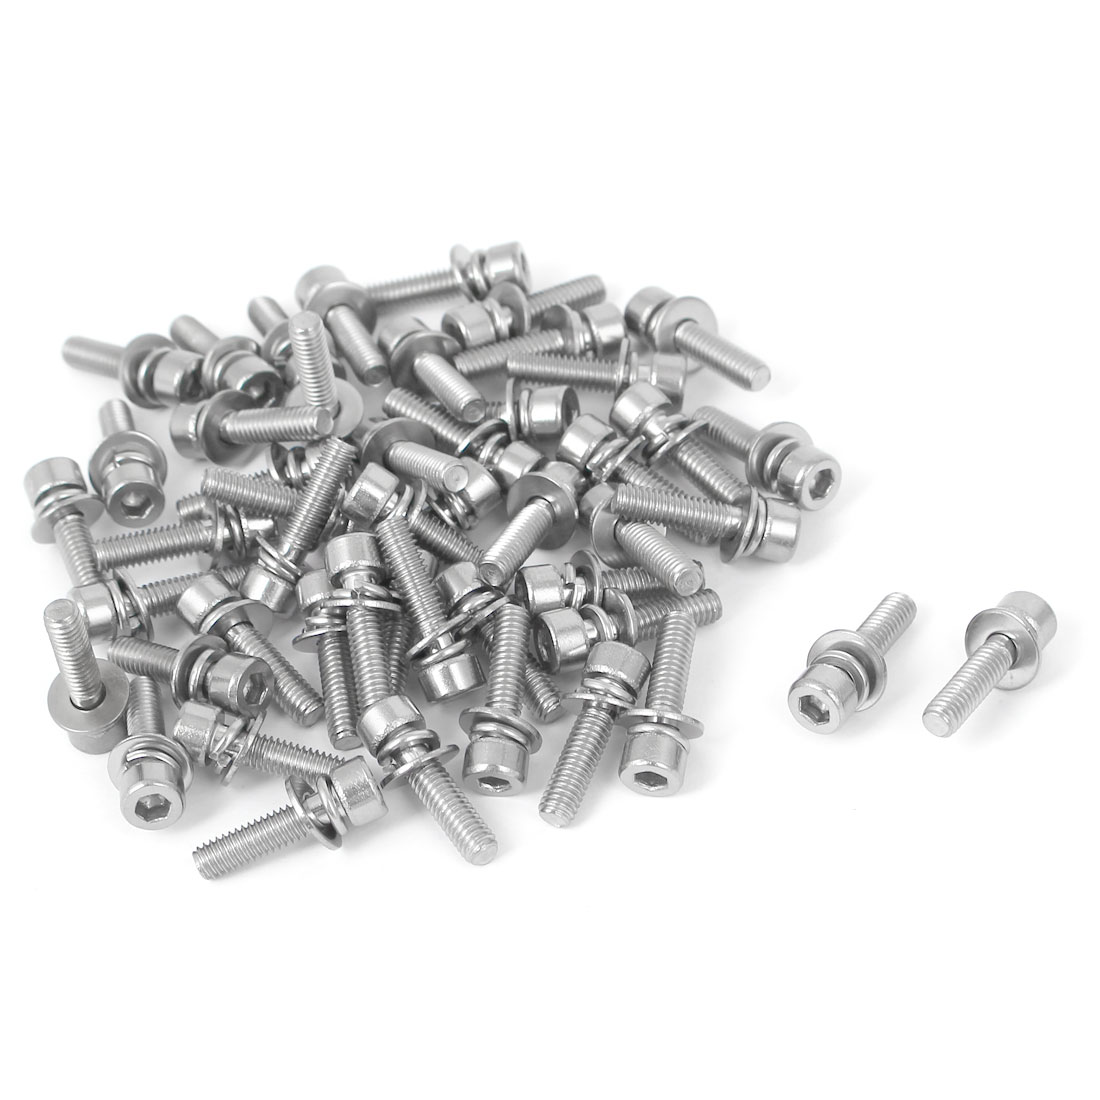 20mm Length M4 x 16mm Thread Hex Socket Head Cap Screw w Washer Silver Tone 50 Pcs